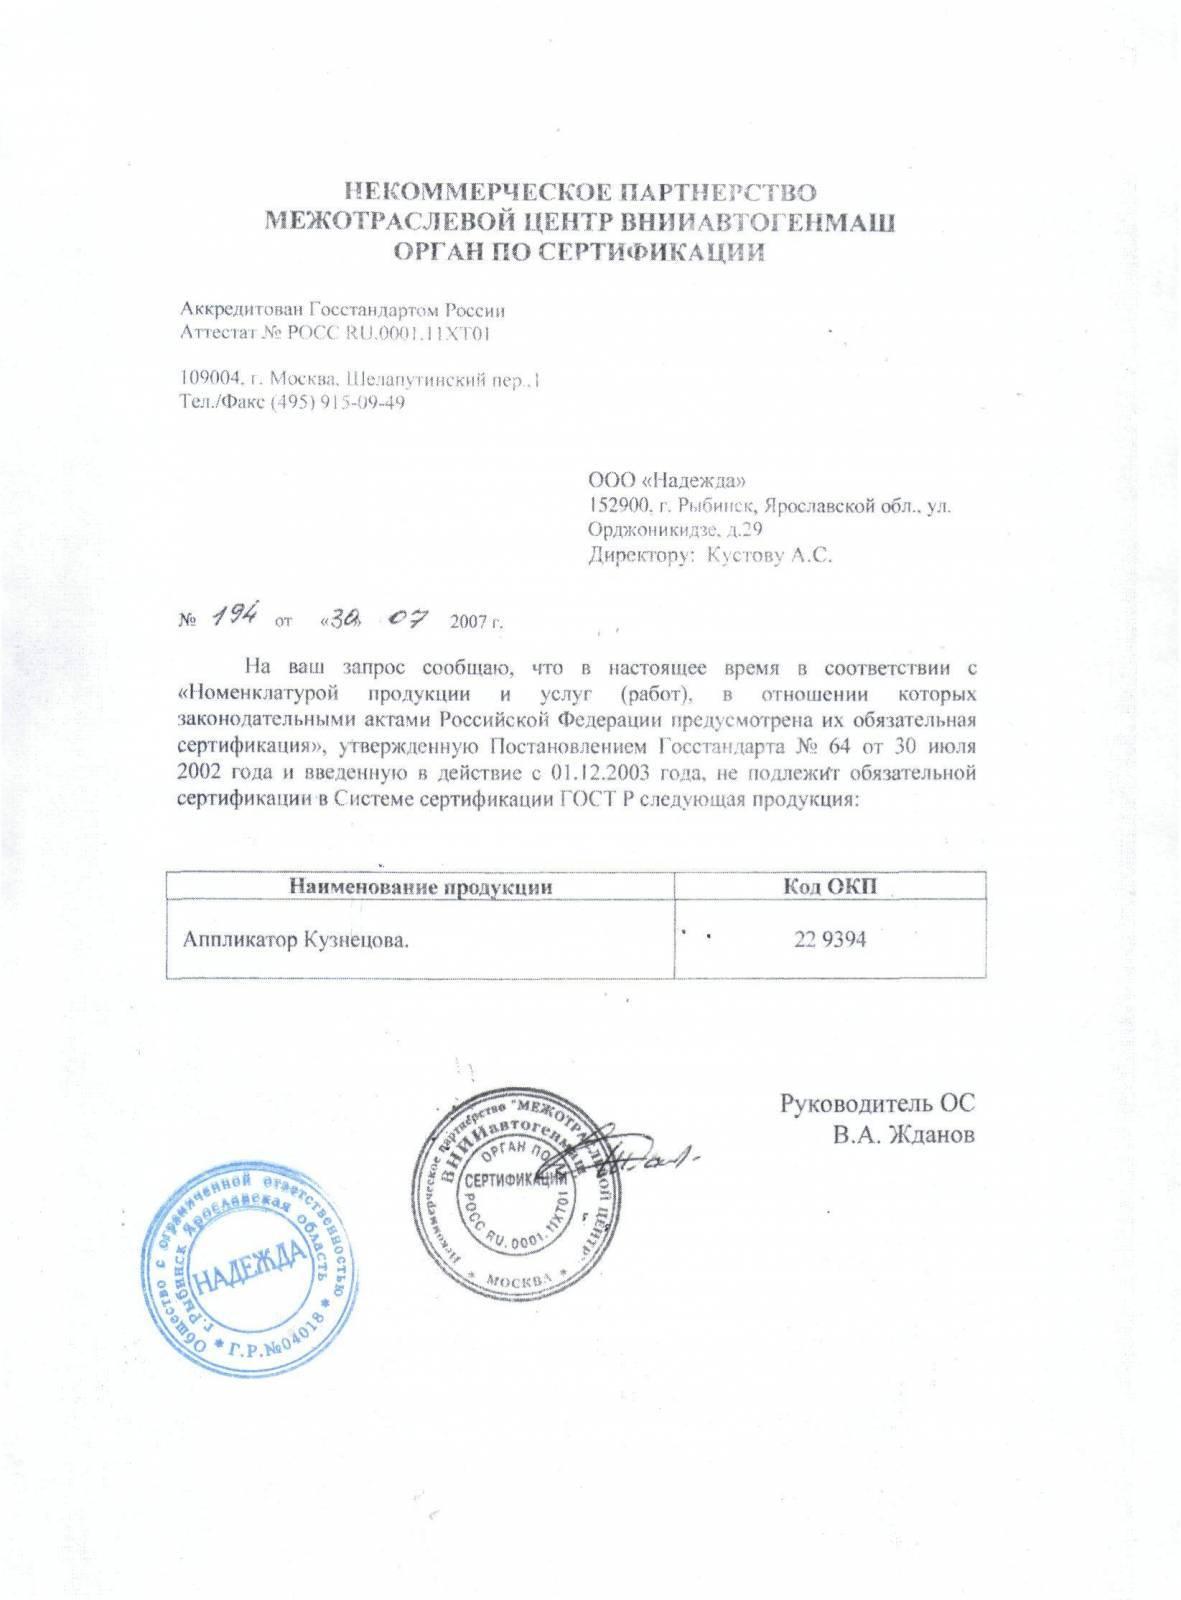 Аппликатор Кузнецова игольчатый шейный «Биомаг»